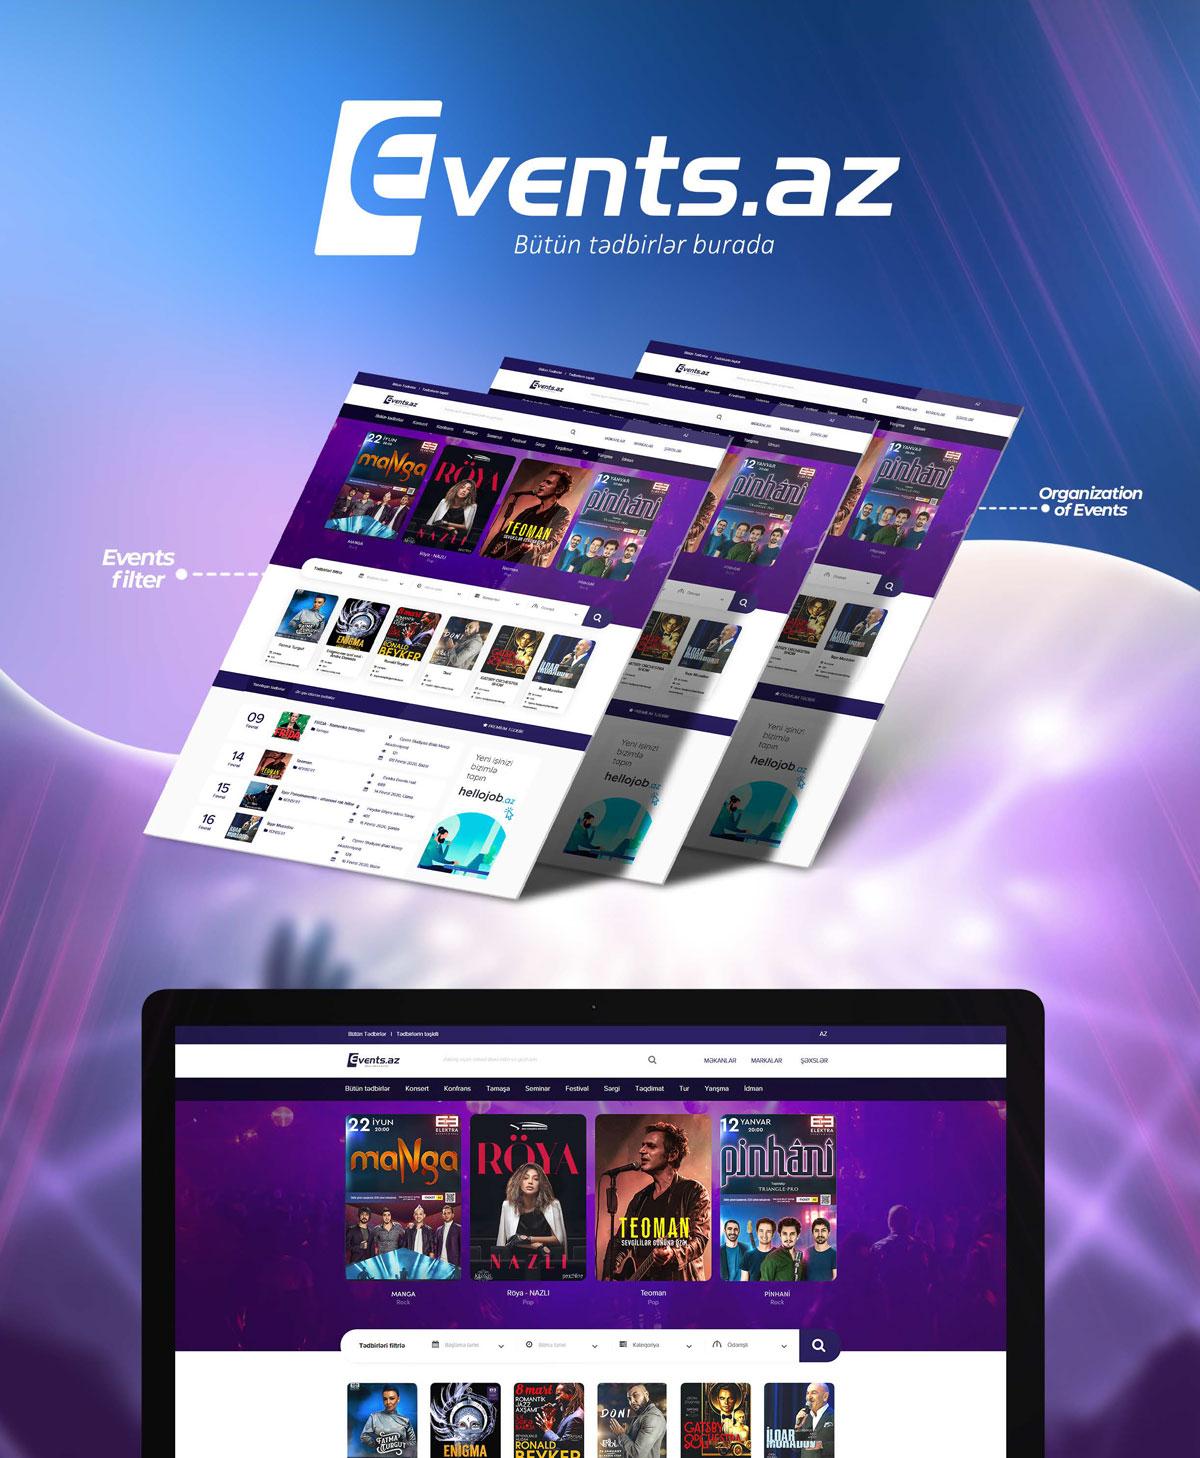 Events.az image - 1